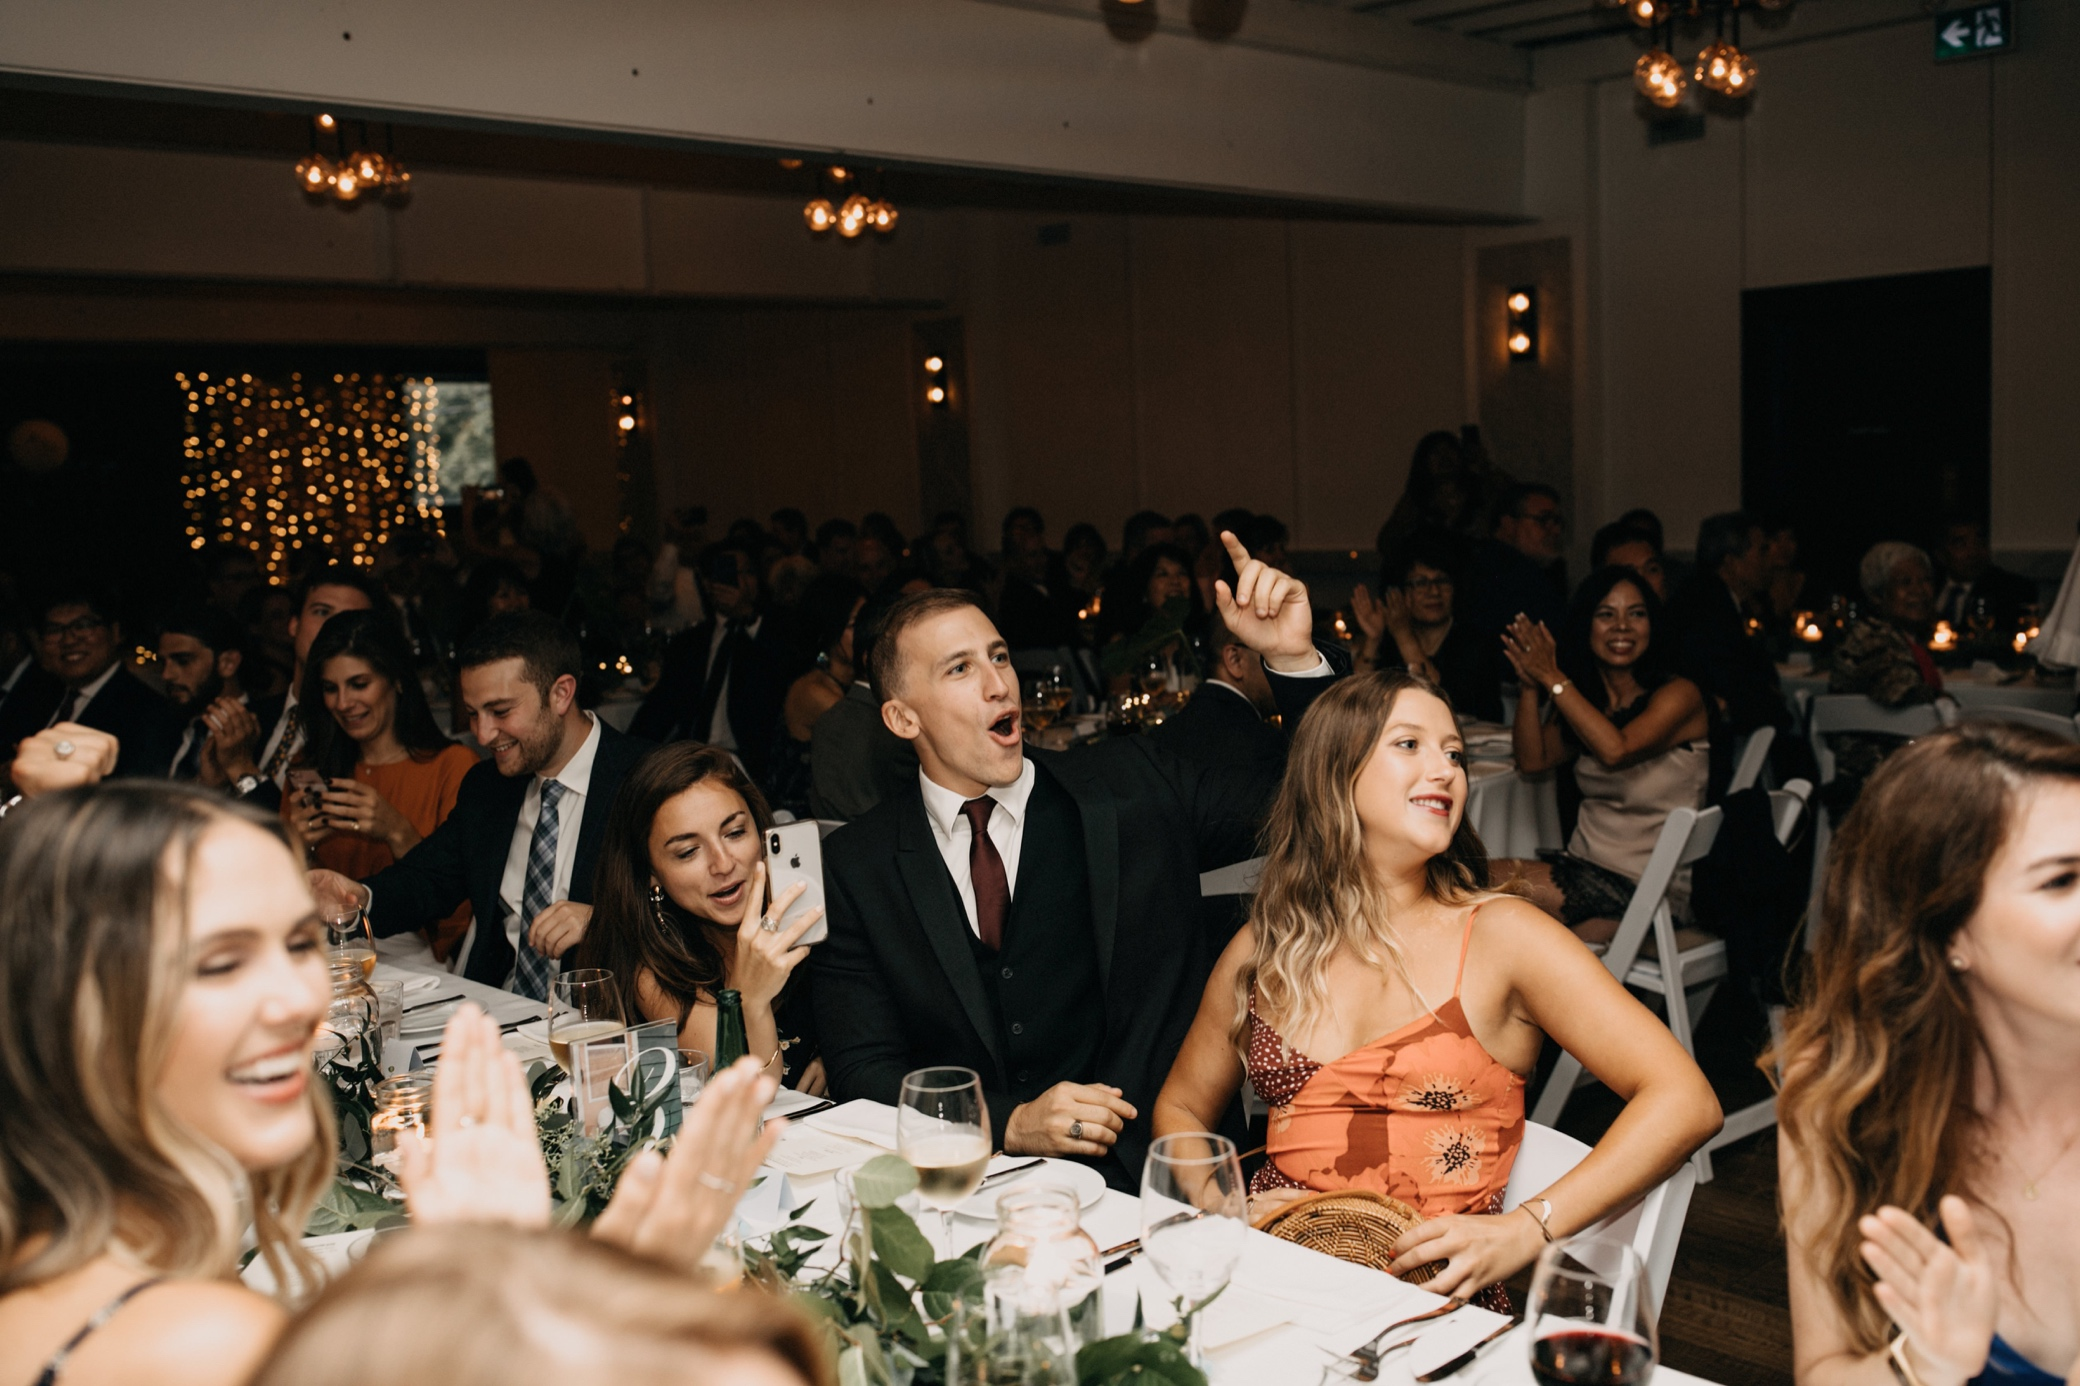 096_The Broadview Hotel Wedding (627 of 913).jpg